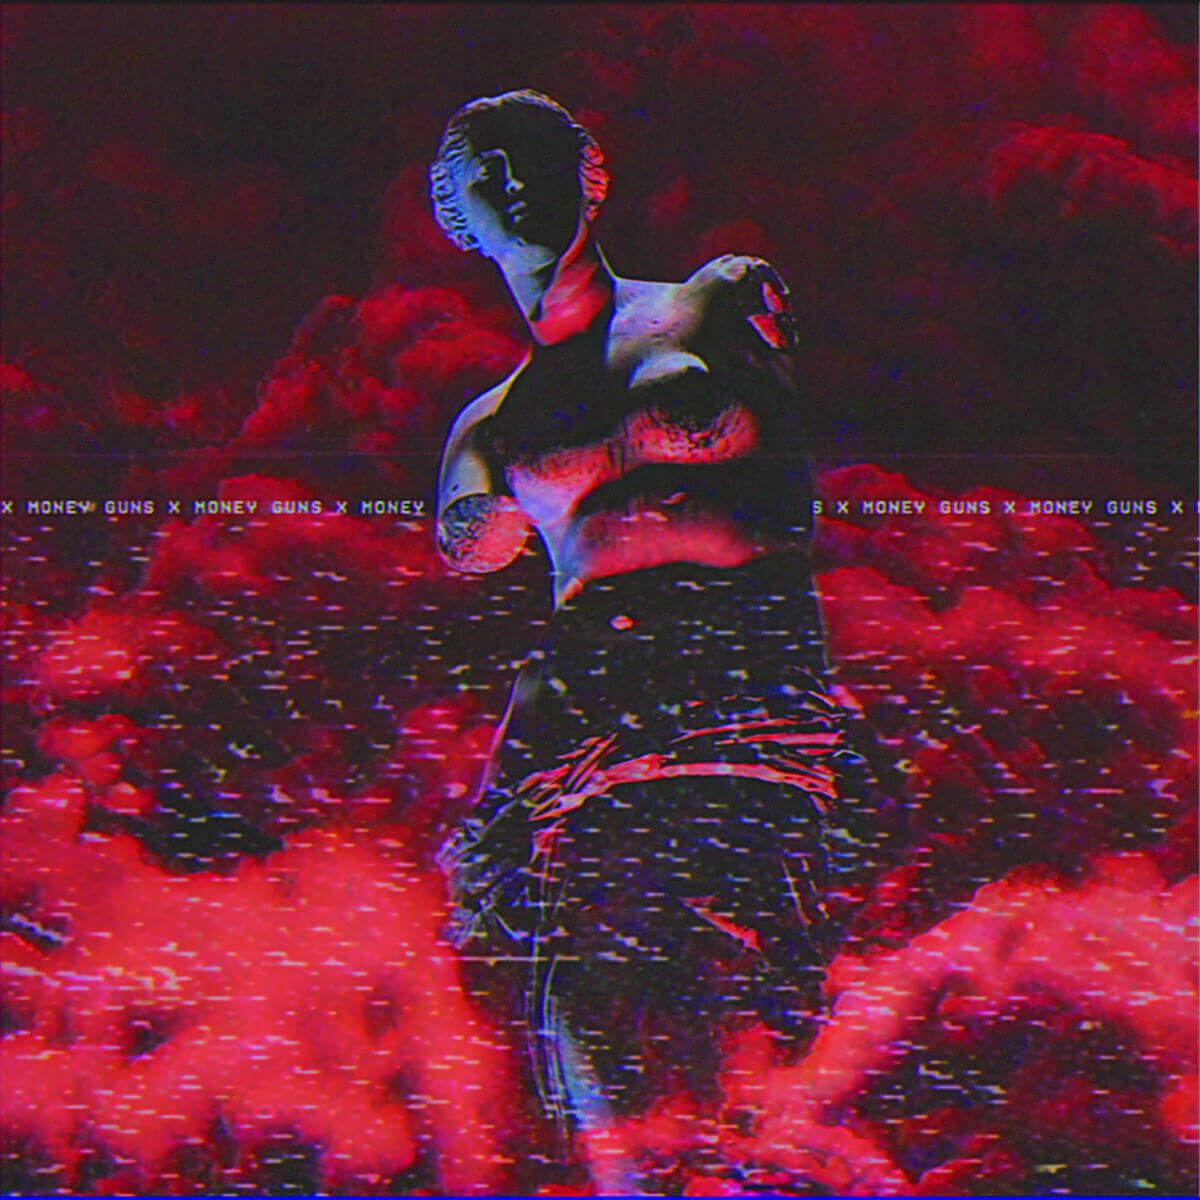 GUNS X MONEY ALBUM COVER